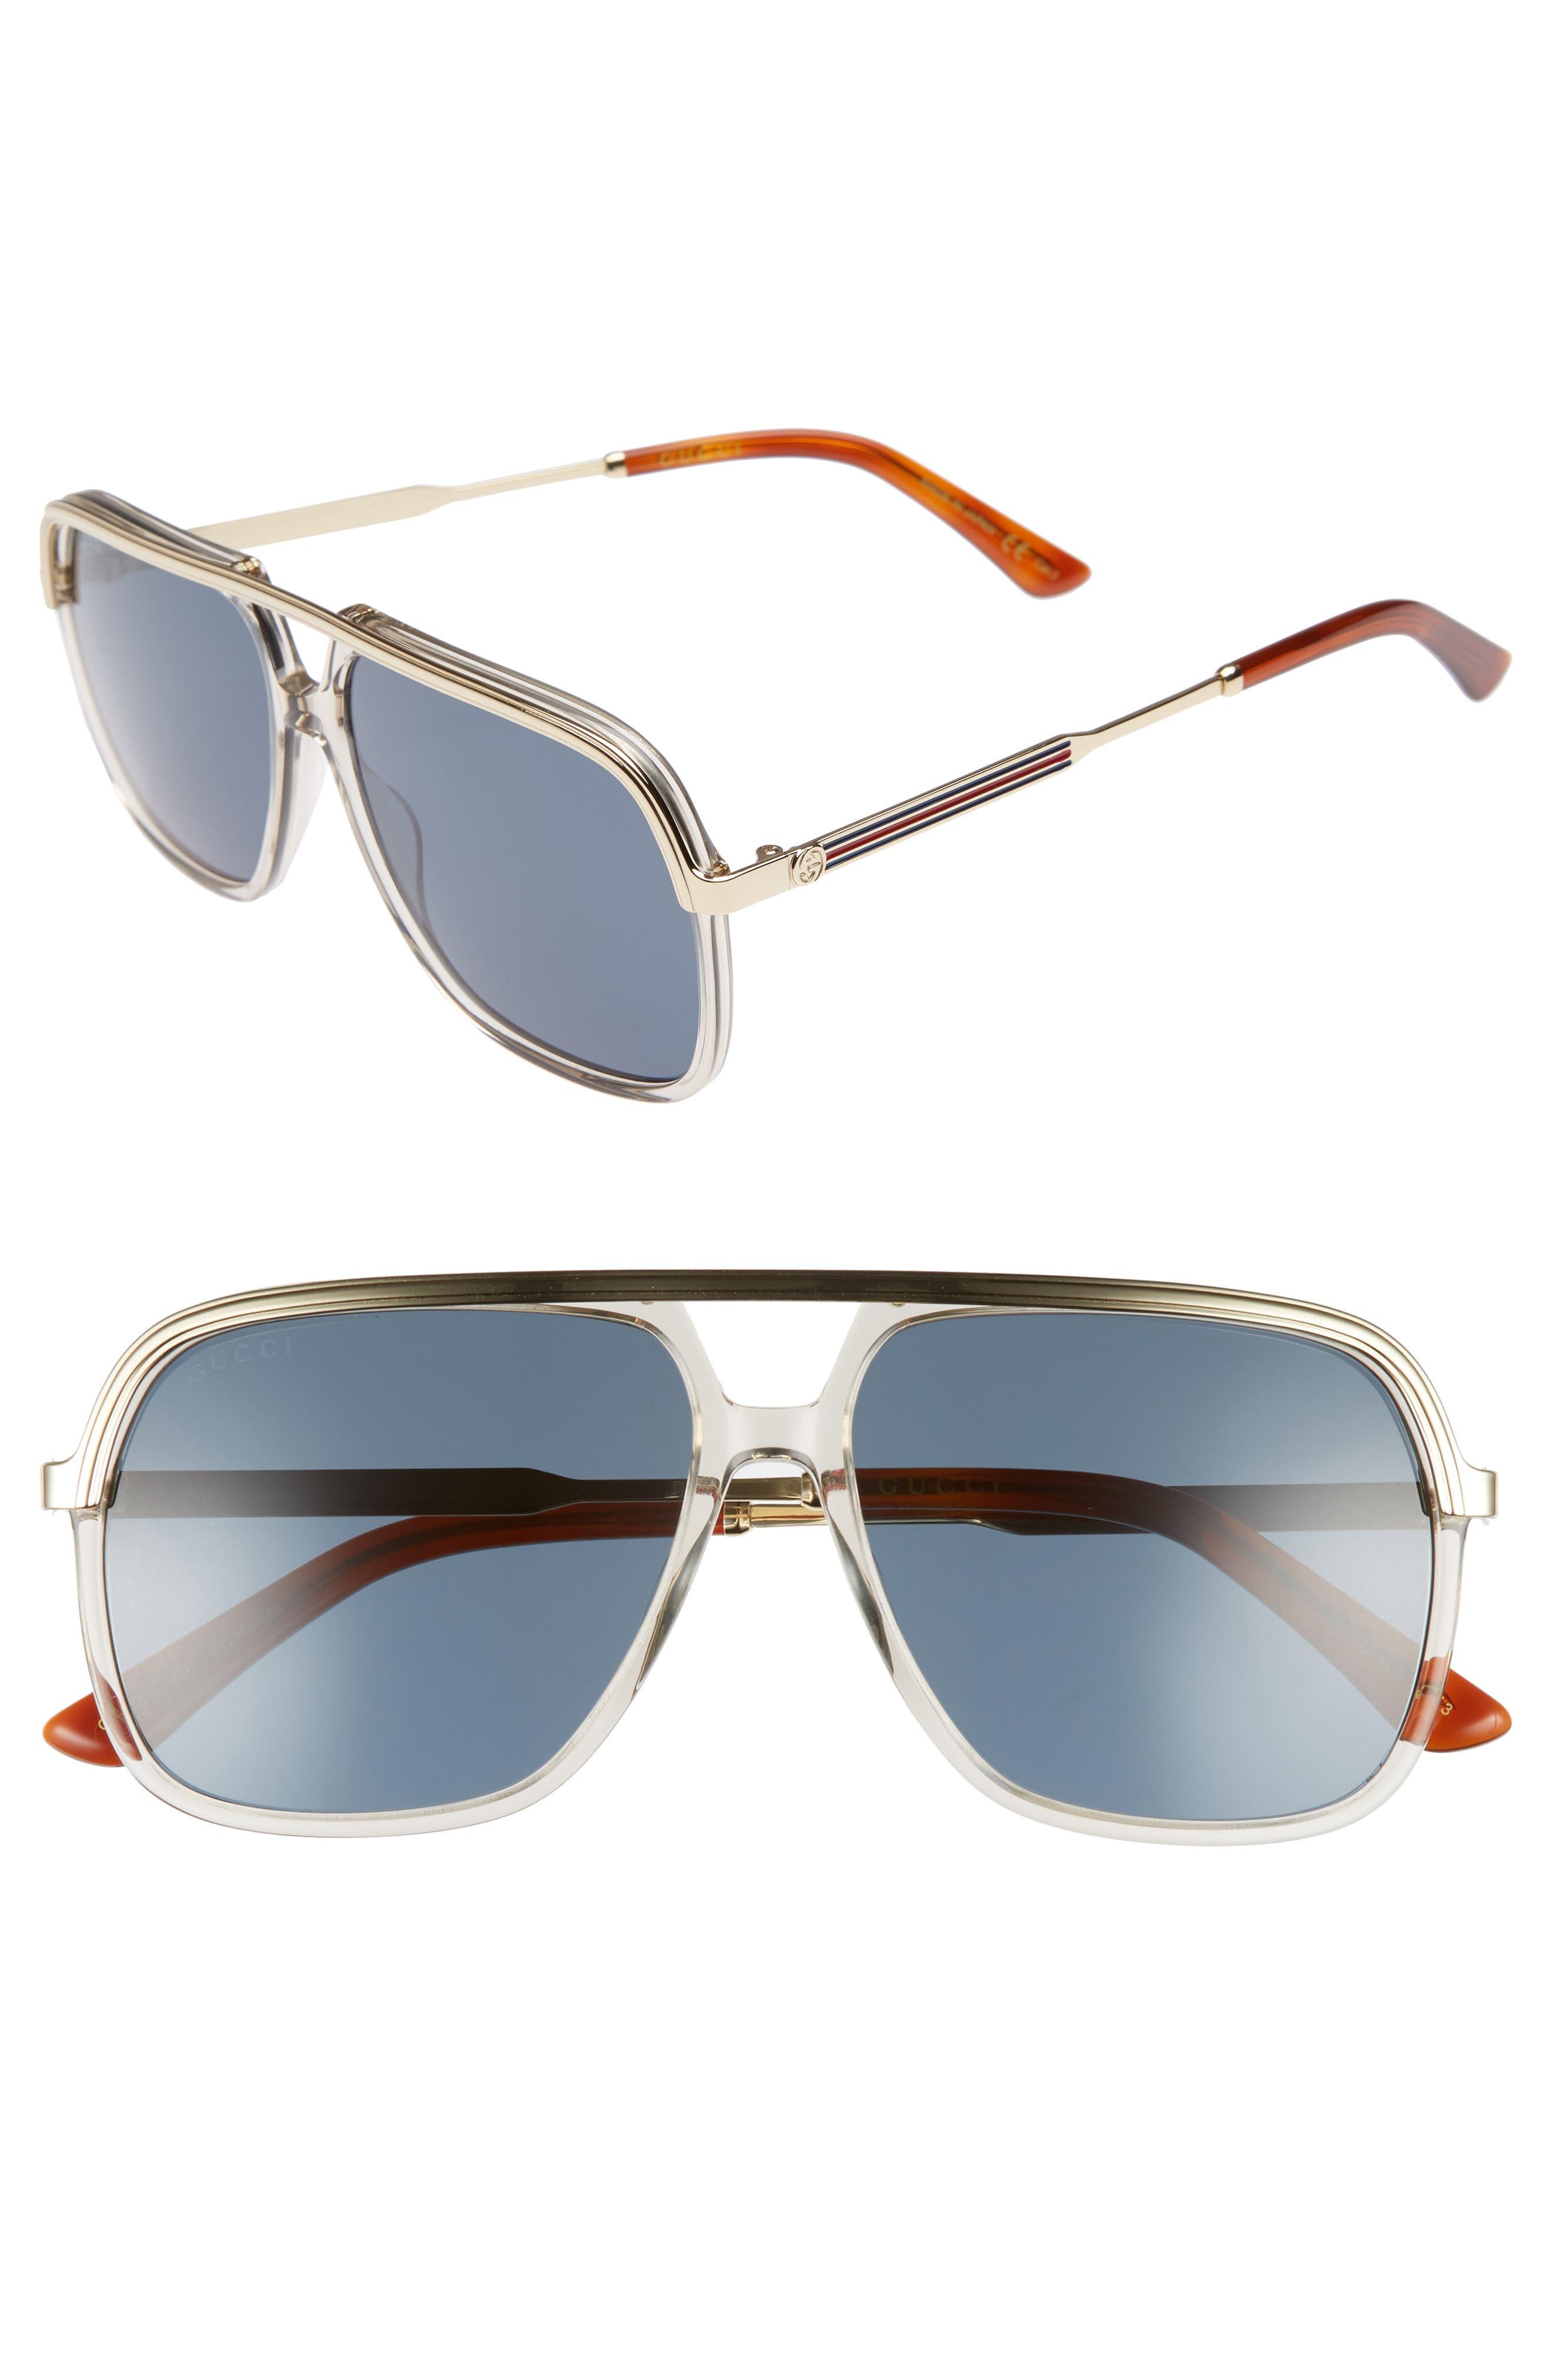 57mm Aviator Sunglasses,                         Main,                         color, Mustard/ Endura Gold